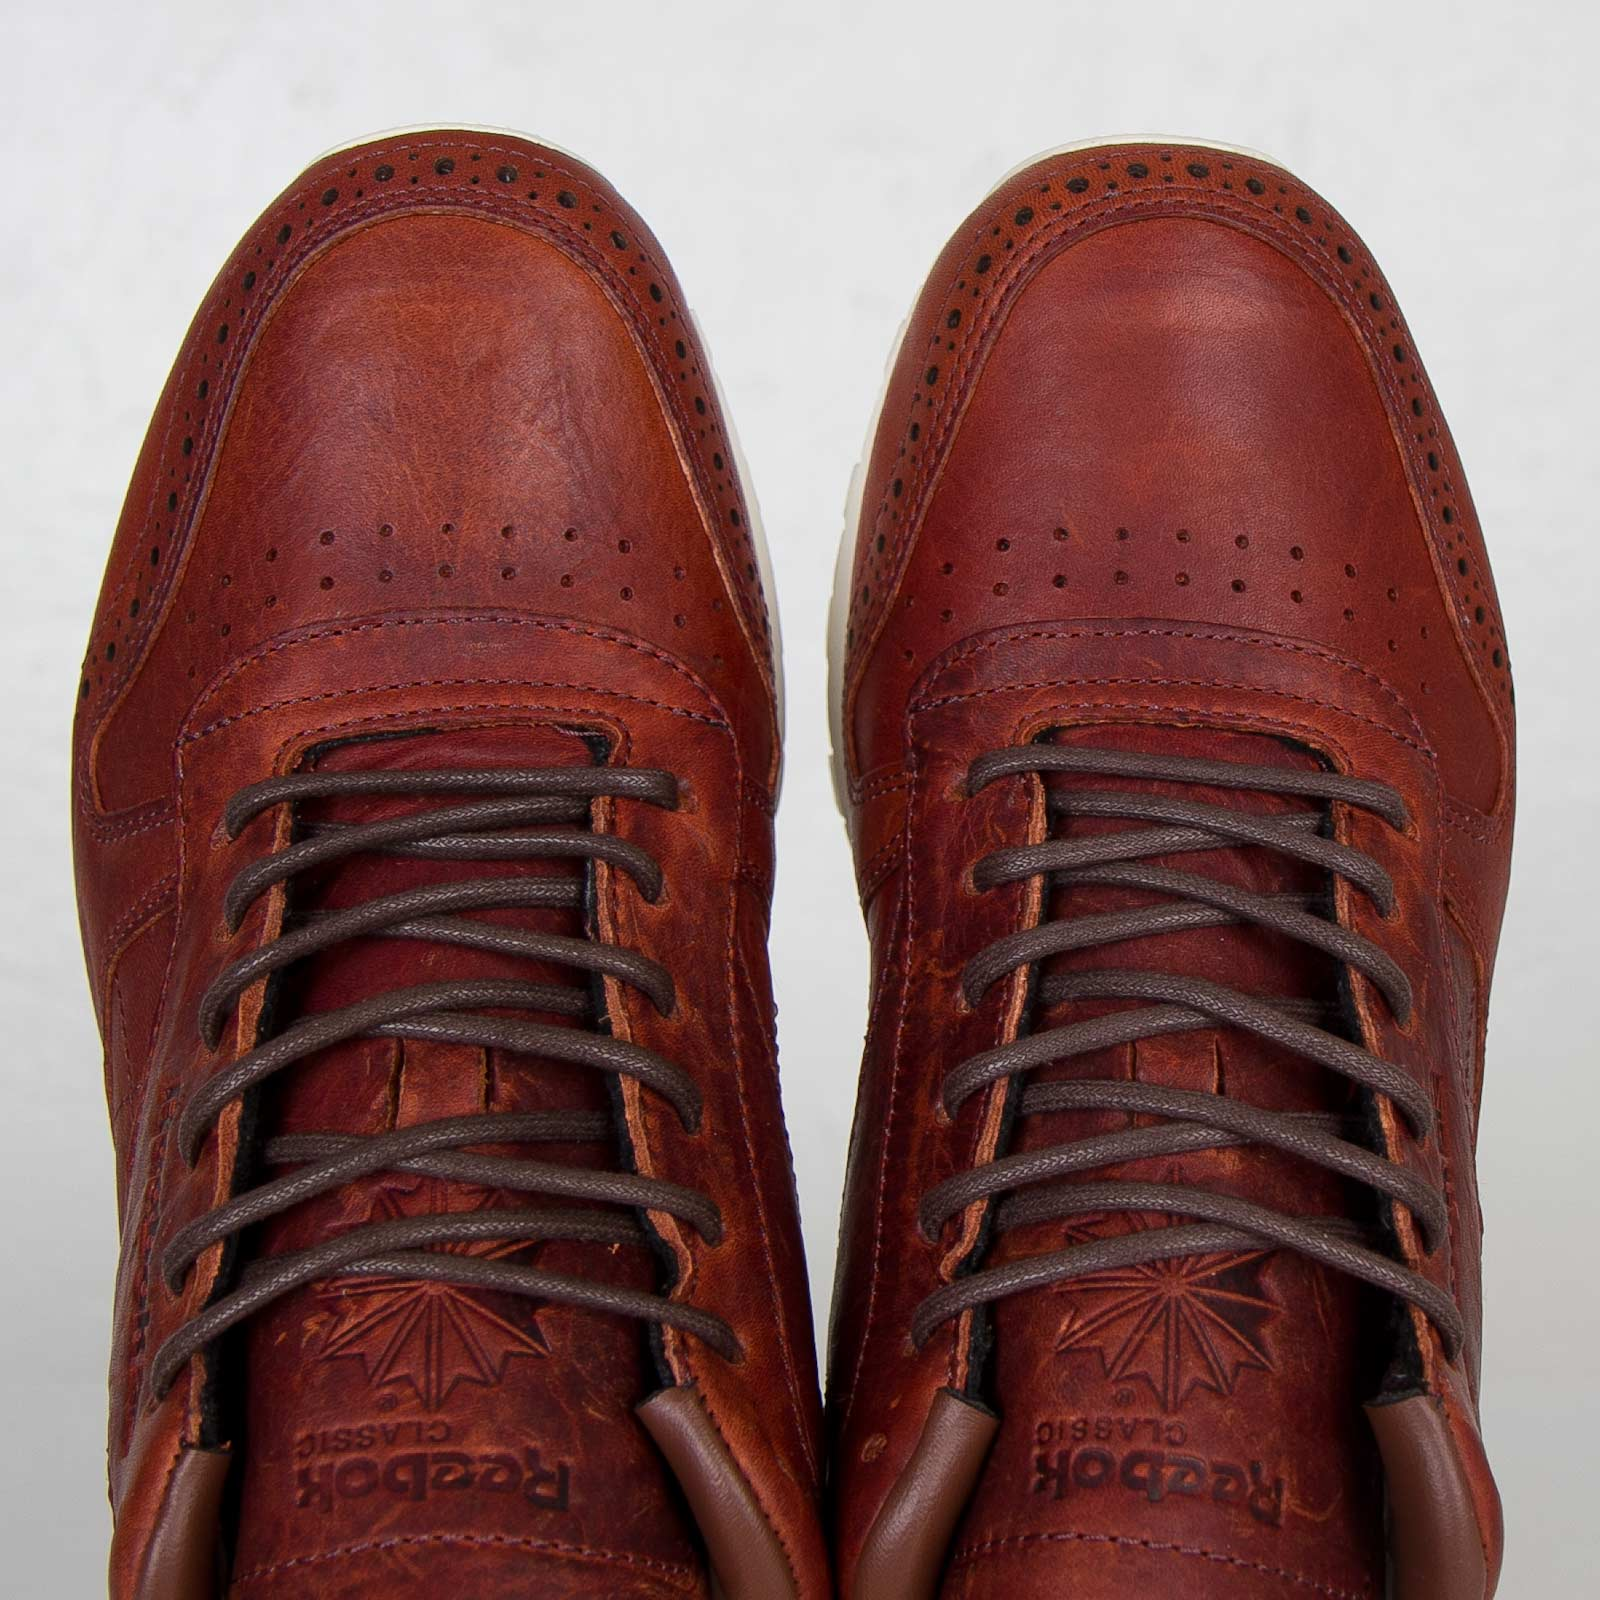 9533bf1abb5 Reebok Classic Leather Lux CF Stead ...